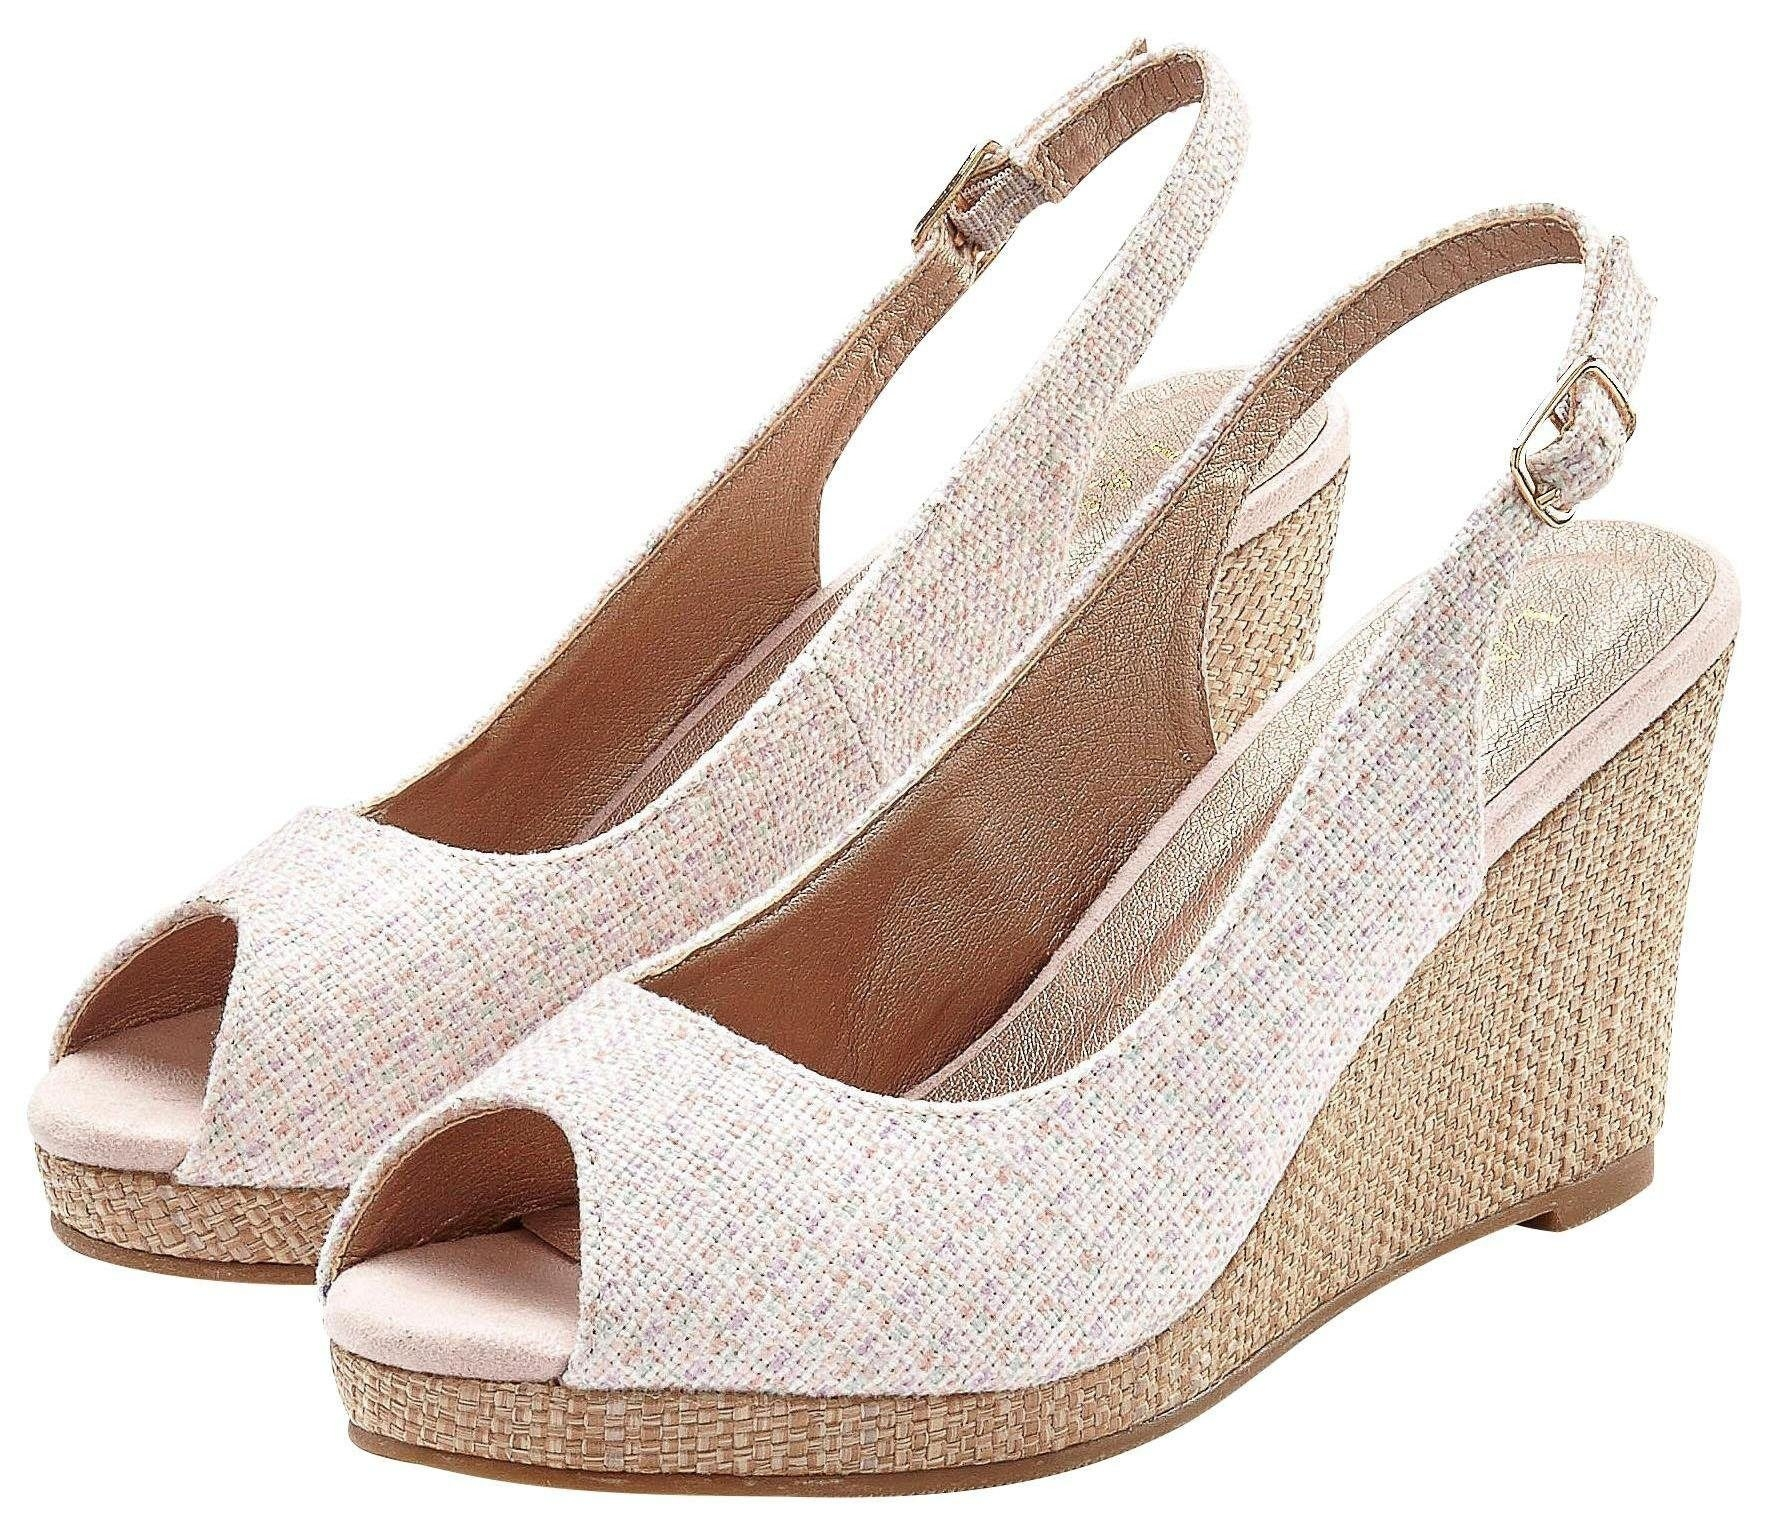 Lascana highheel-sandaaltjes goedkoop op lascana.nl kopen